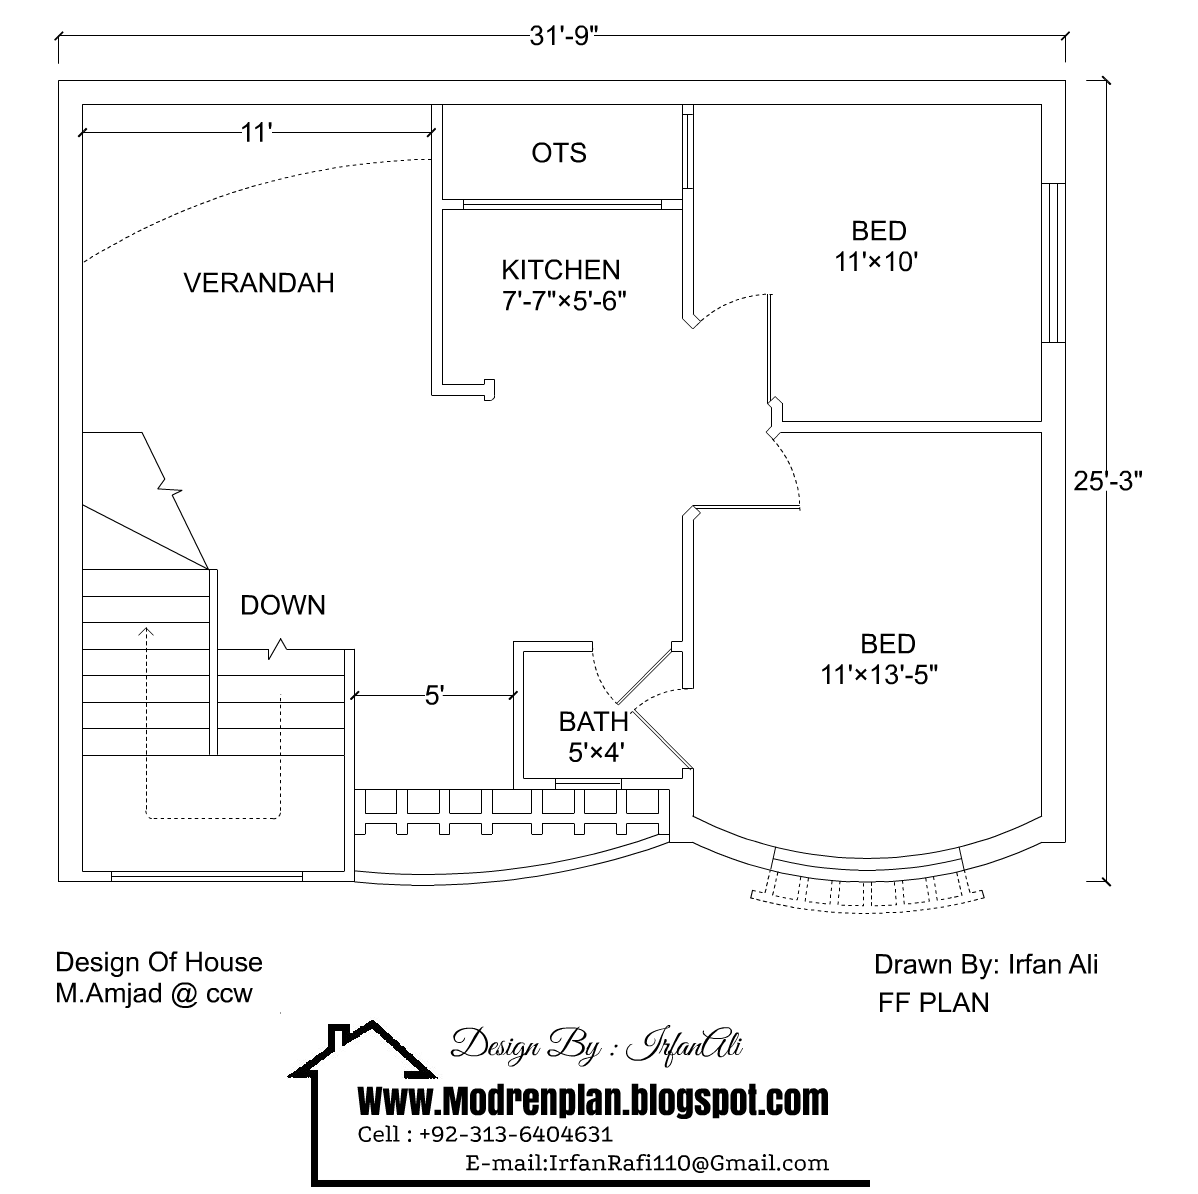 3 Marla House Plan 31 39 9 25 39 3 House Plan